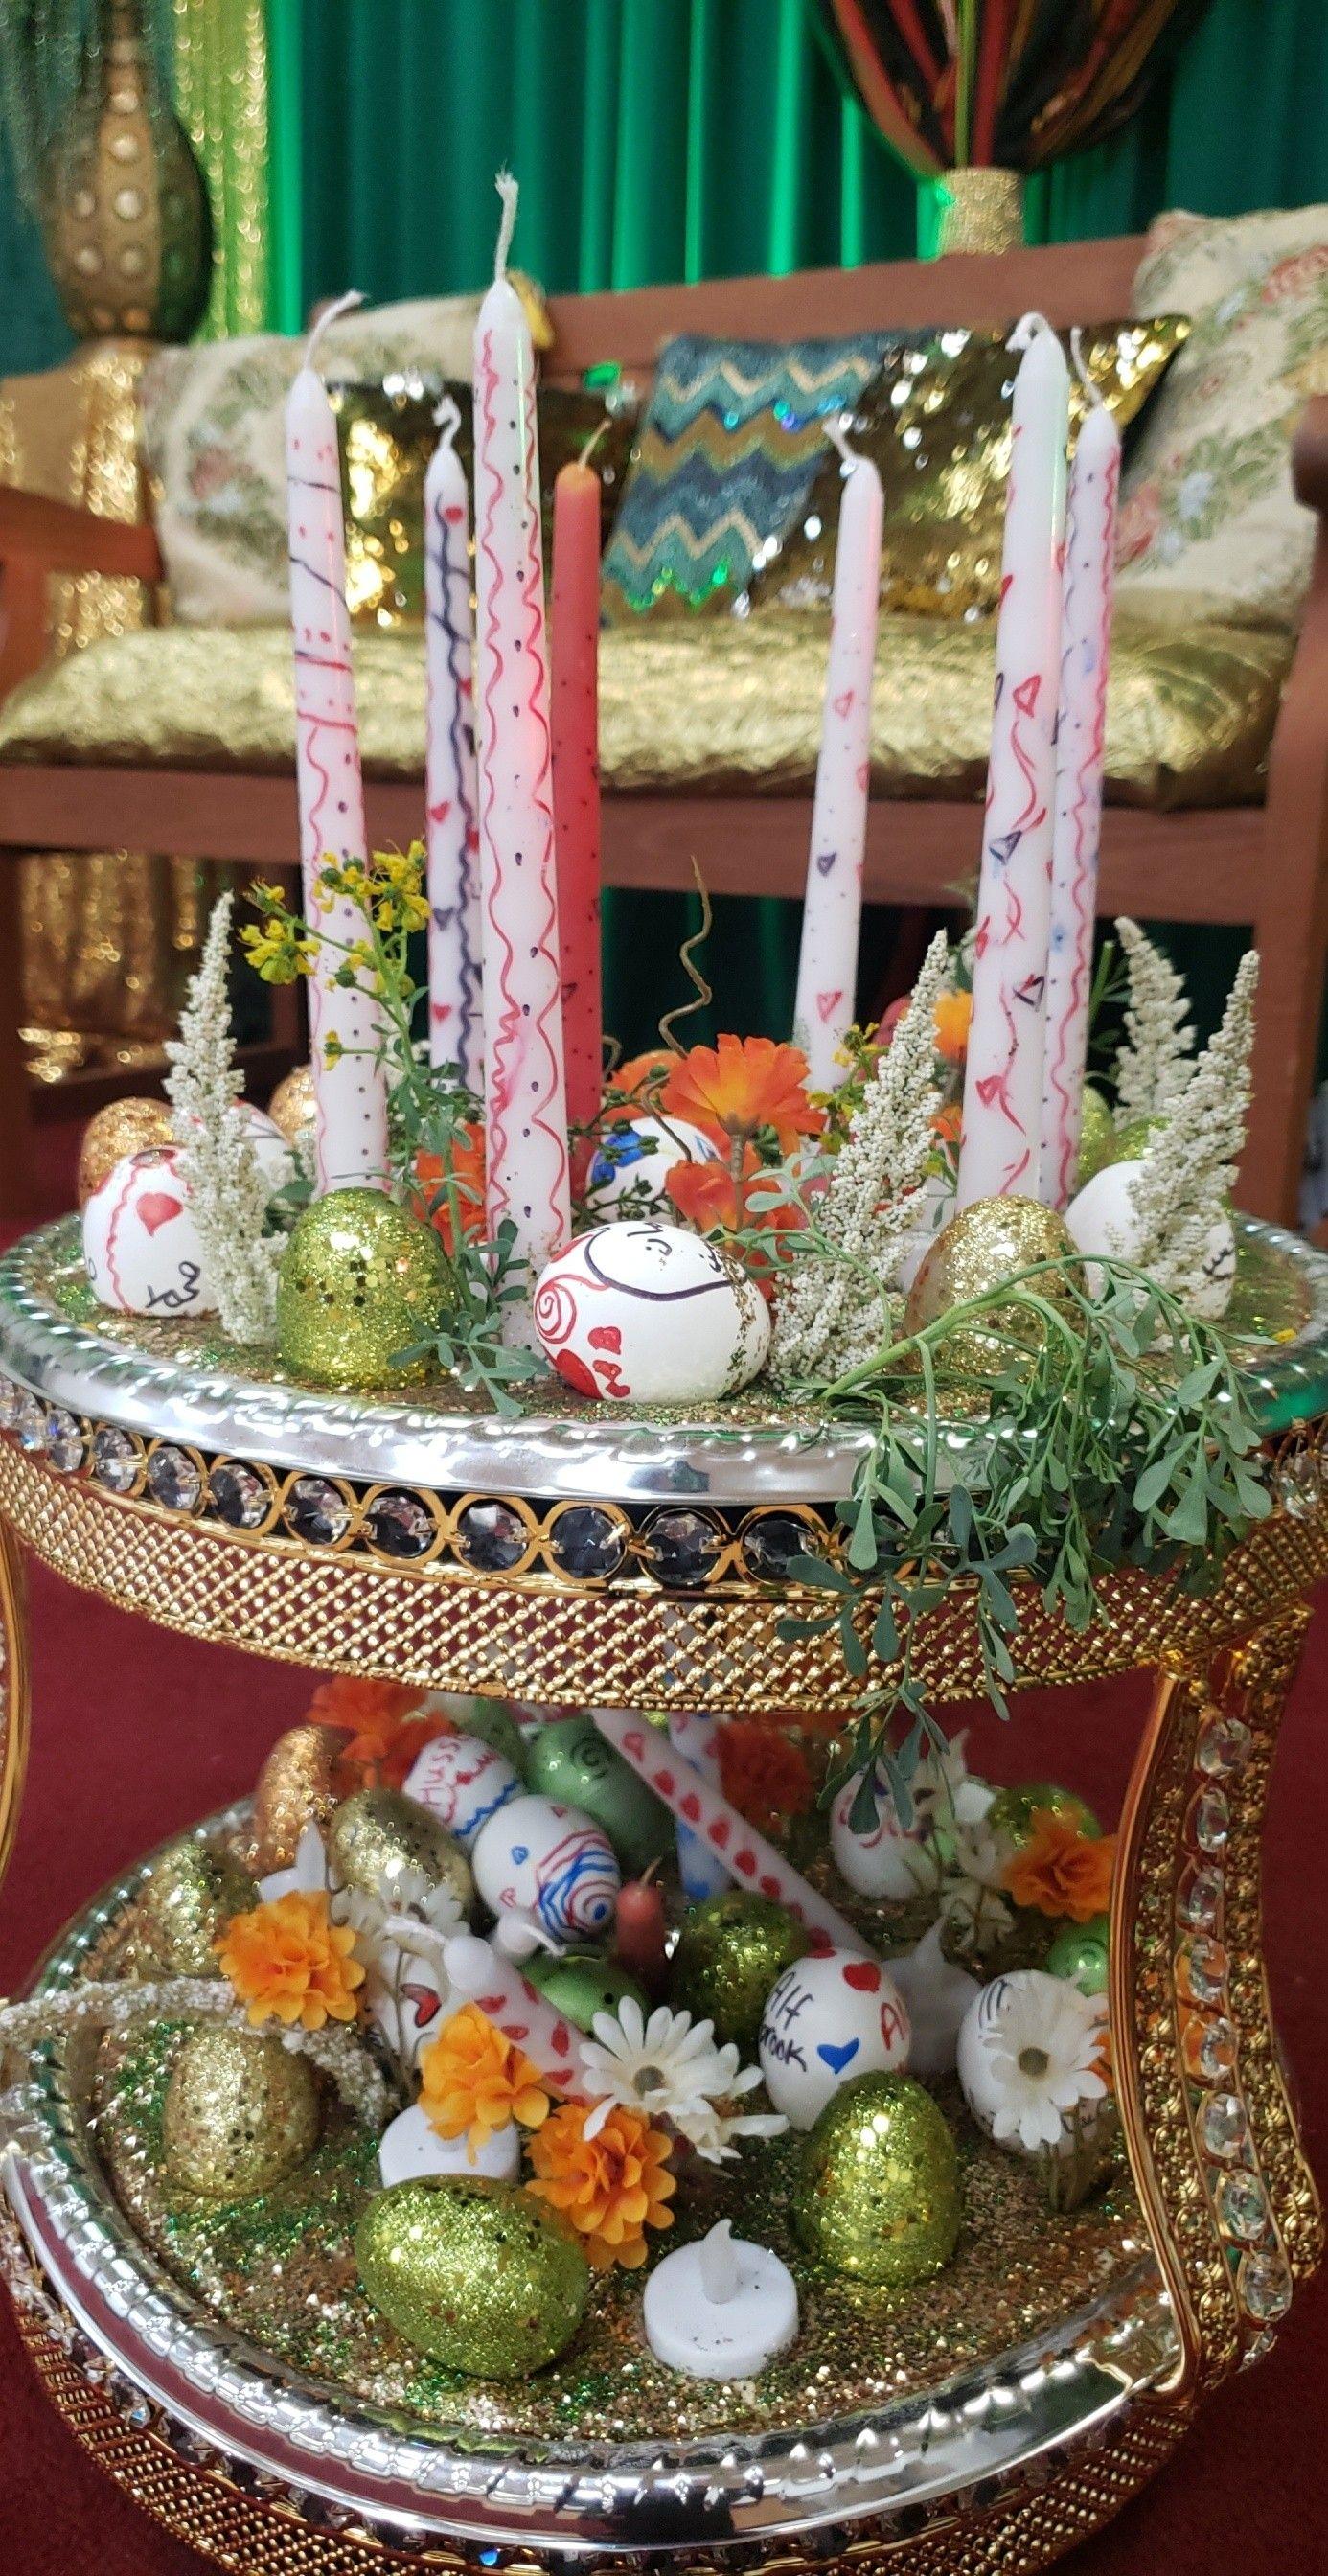 ليله حناء صنعانيه يمانيه اصيله تراثيه Bridal Shower Decorations Bride Photoshoot Traditional Wedding